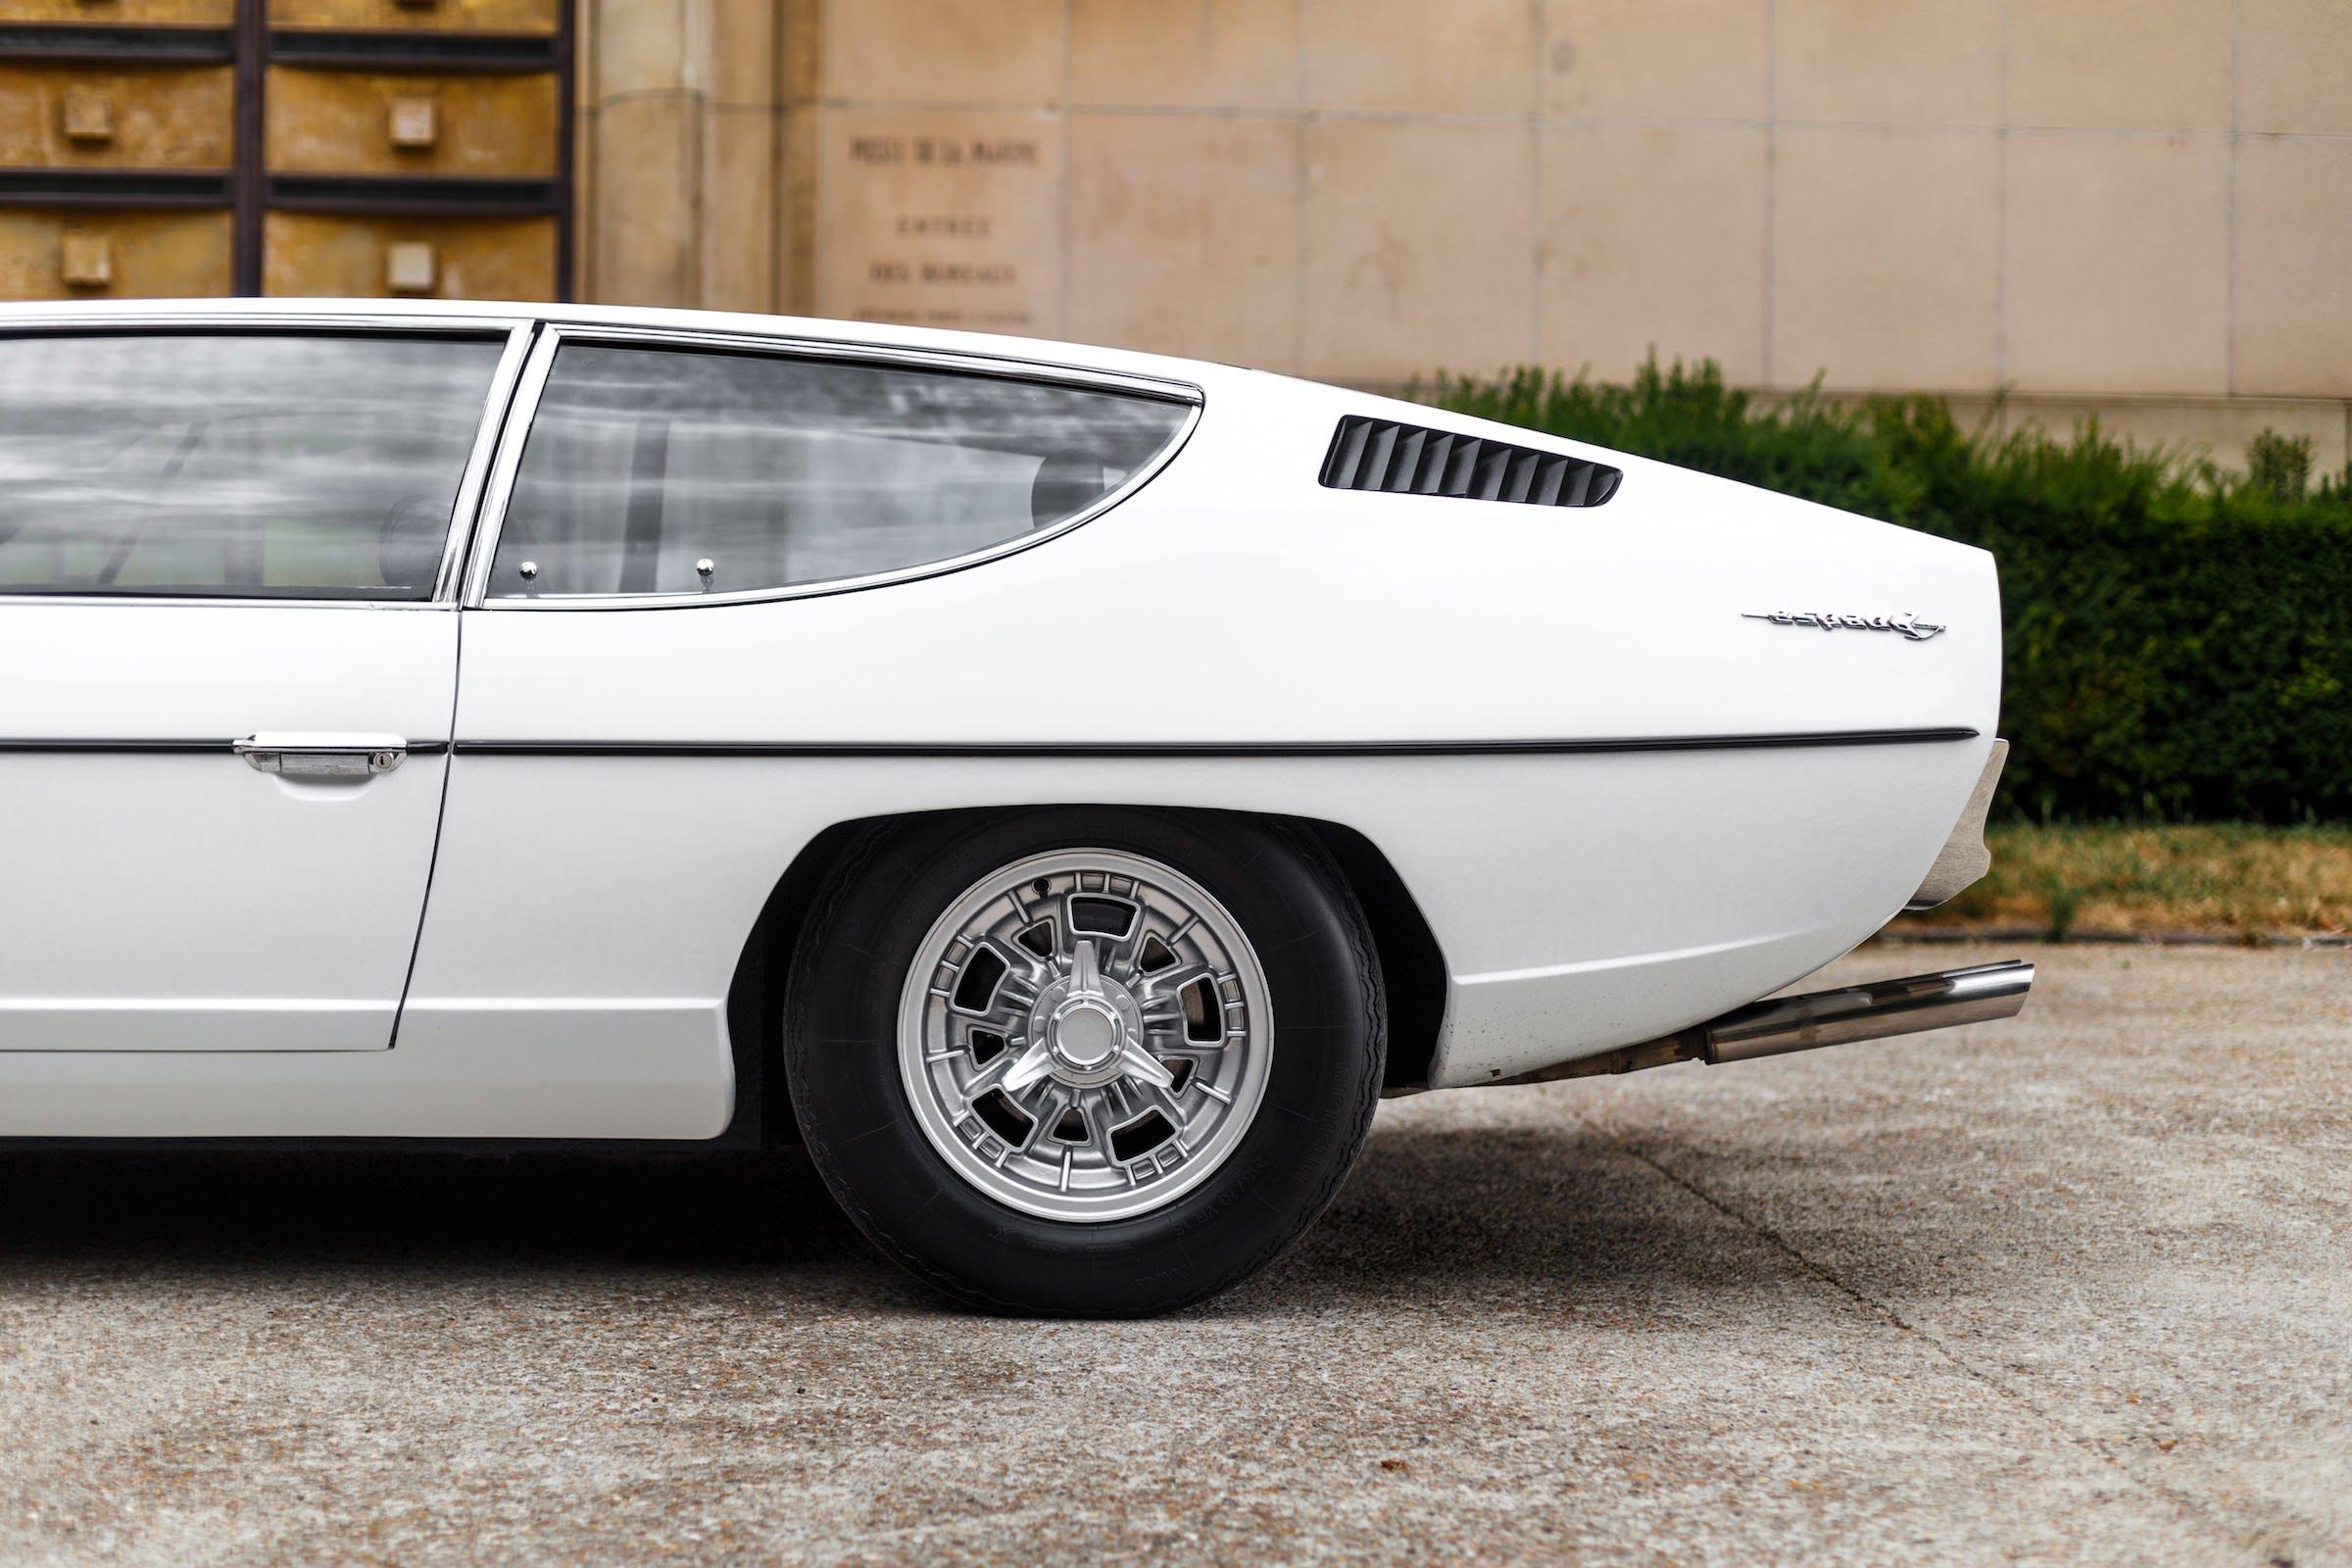 https://silodrome.com/wp-content/uploads/2017/10/Lamborghini-Espada-4.jpeg